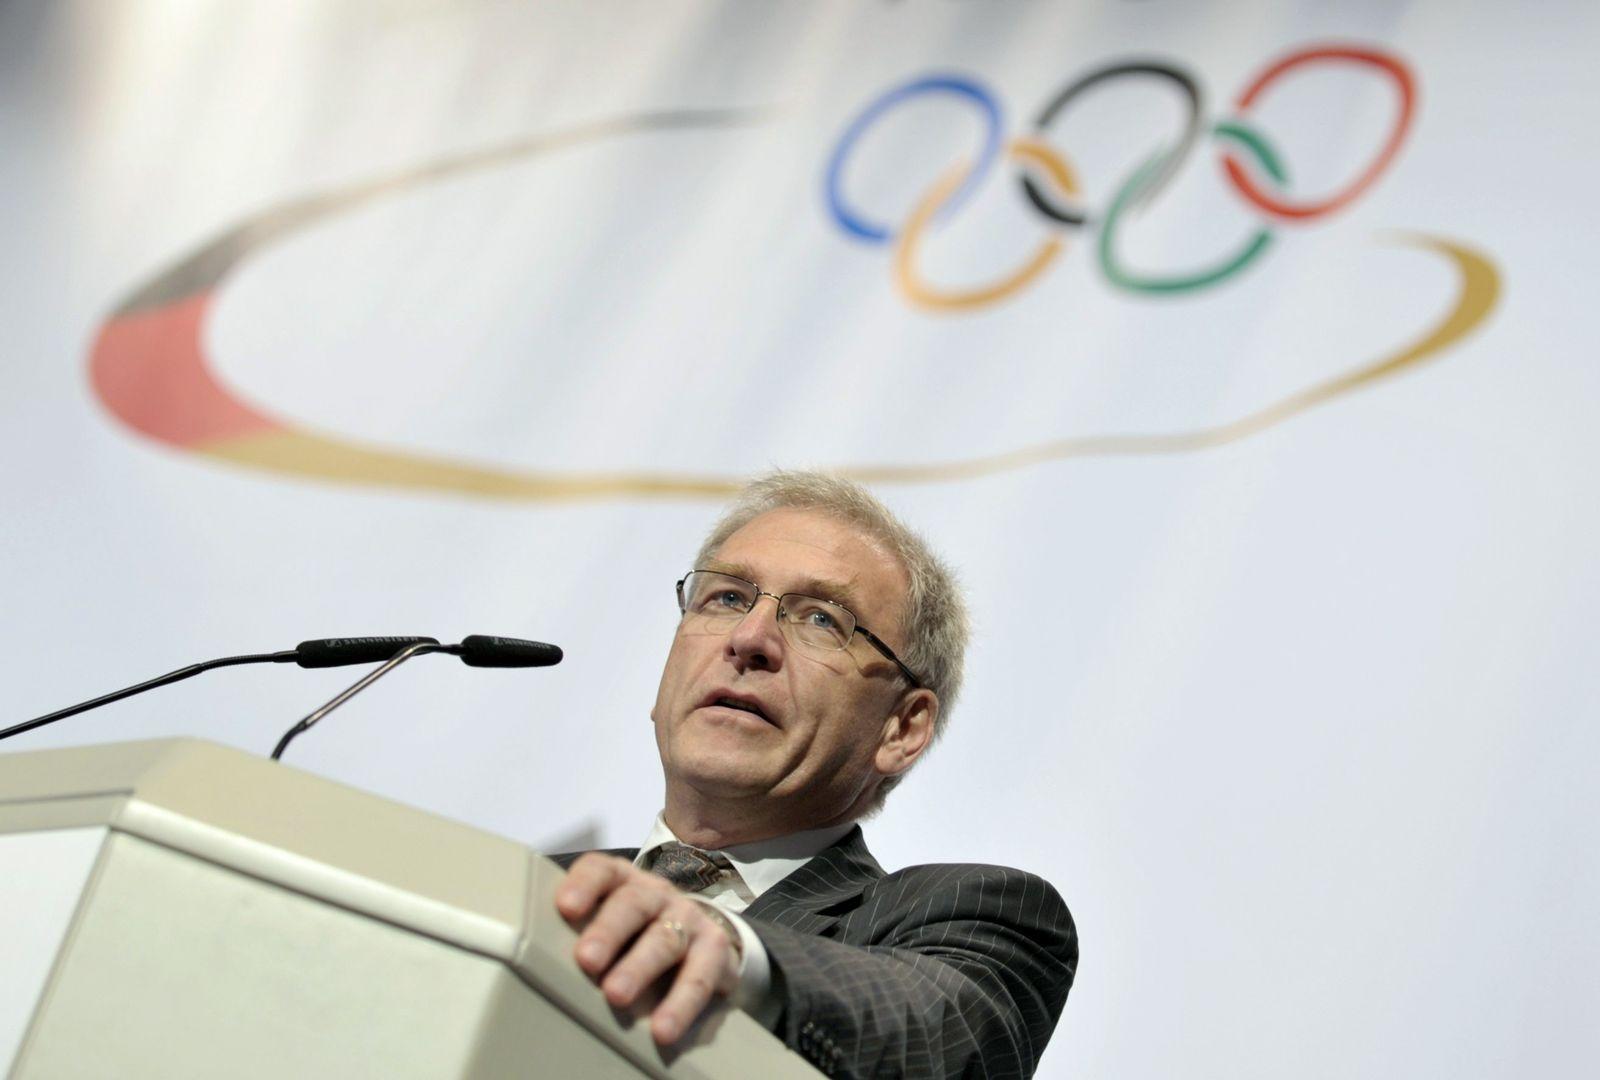 ZDF: DOSB überprüft nach Doping-Verdacht Harting-Trainer Goldmann